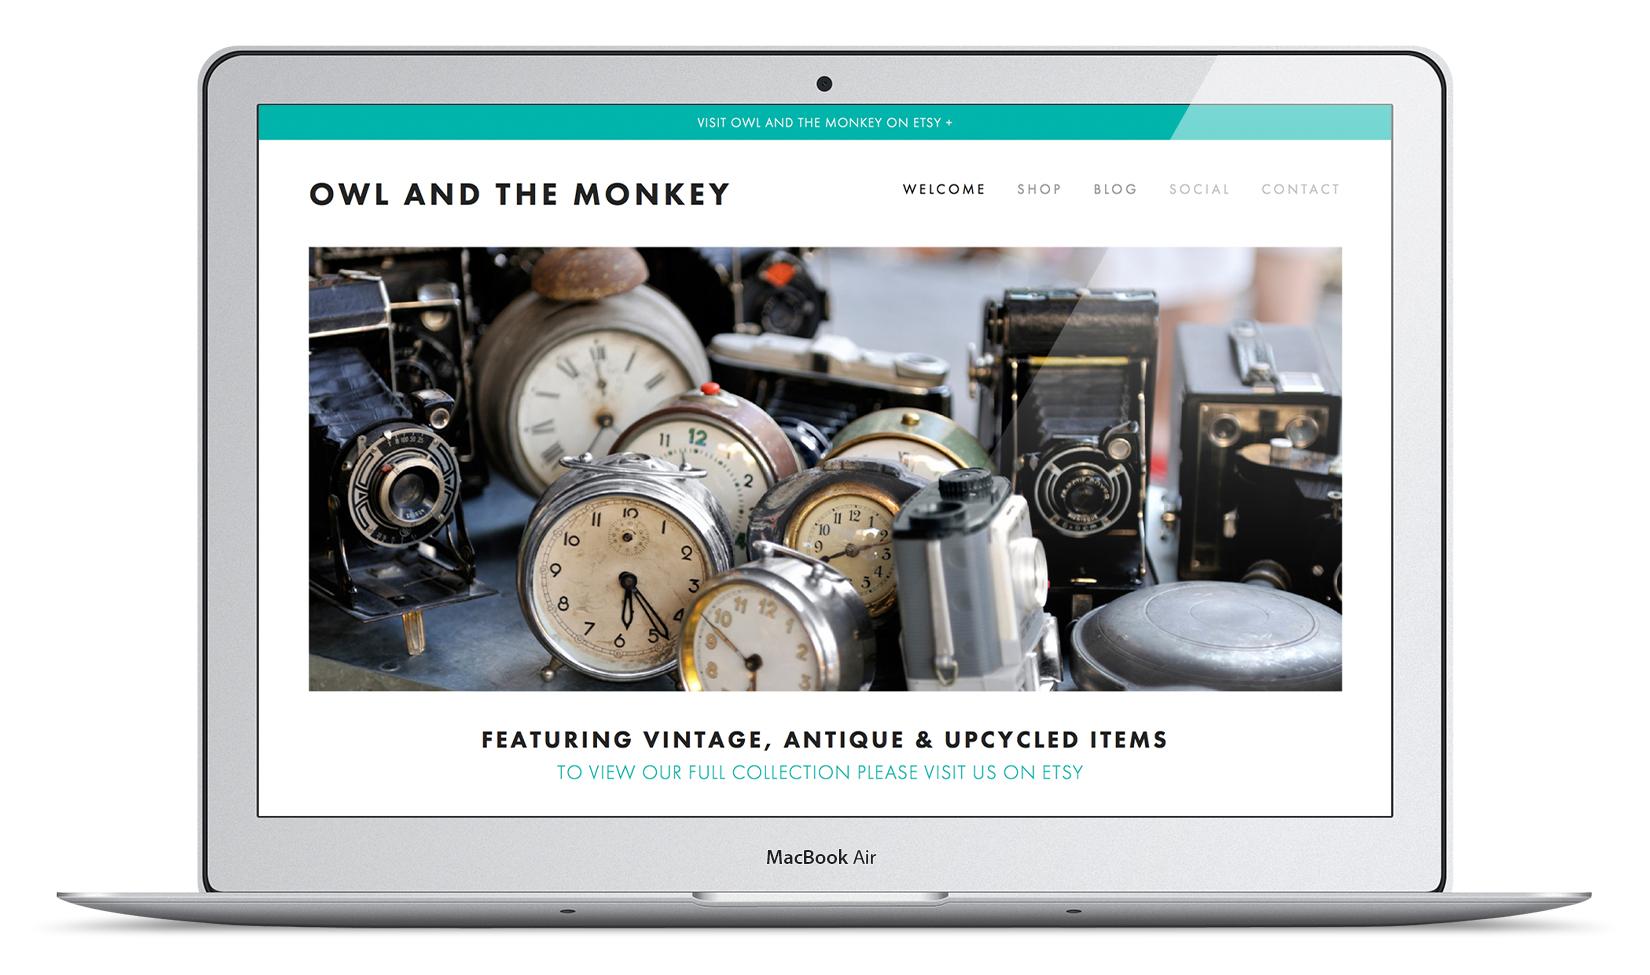 owl-and-the-monkey-homepage.jpg